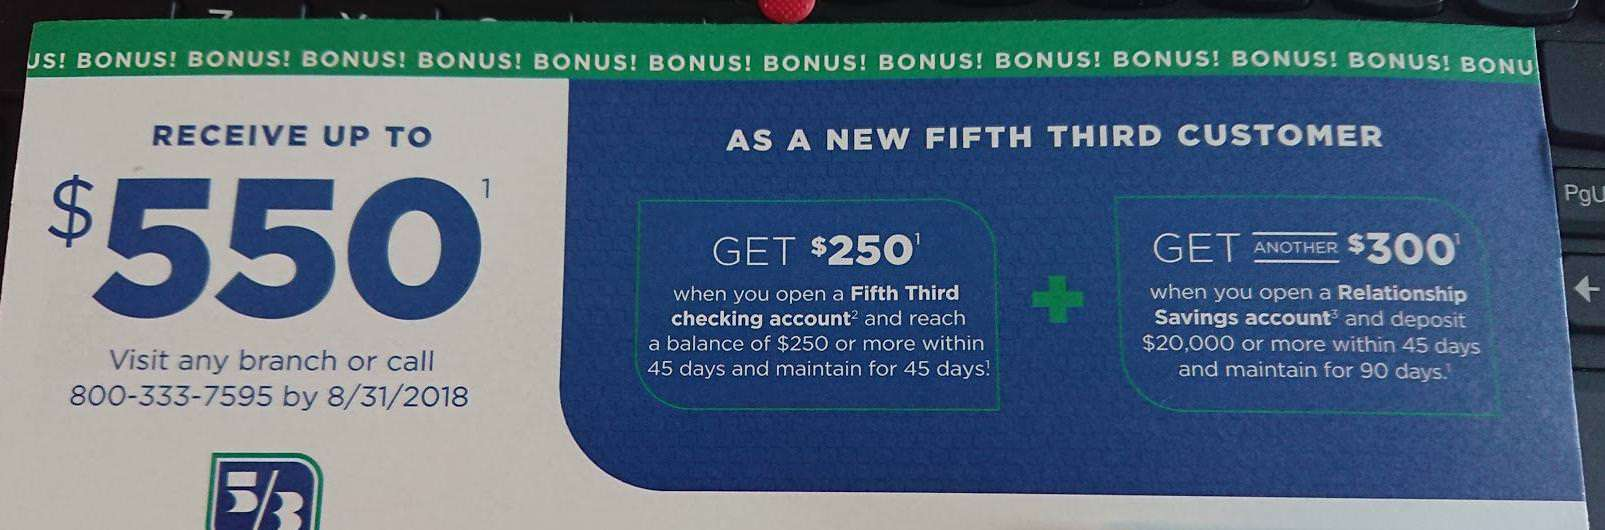 Fifth Third Bank Checking & Savings Bonus: Earn up to $500/$550